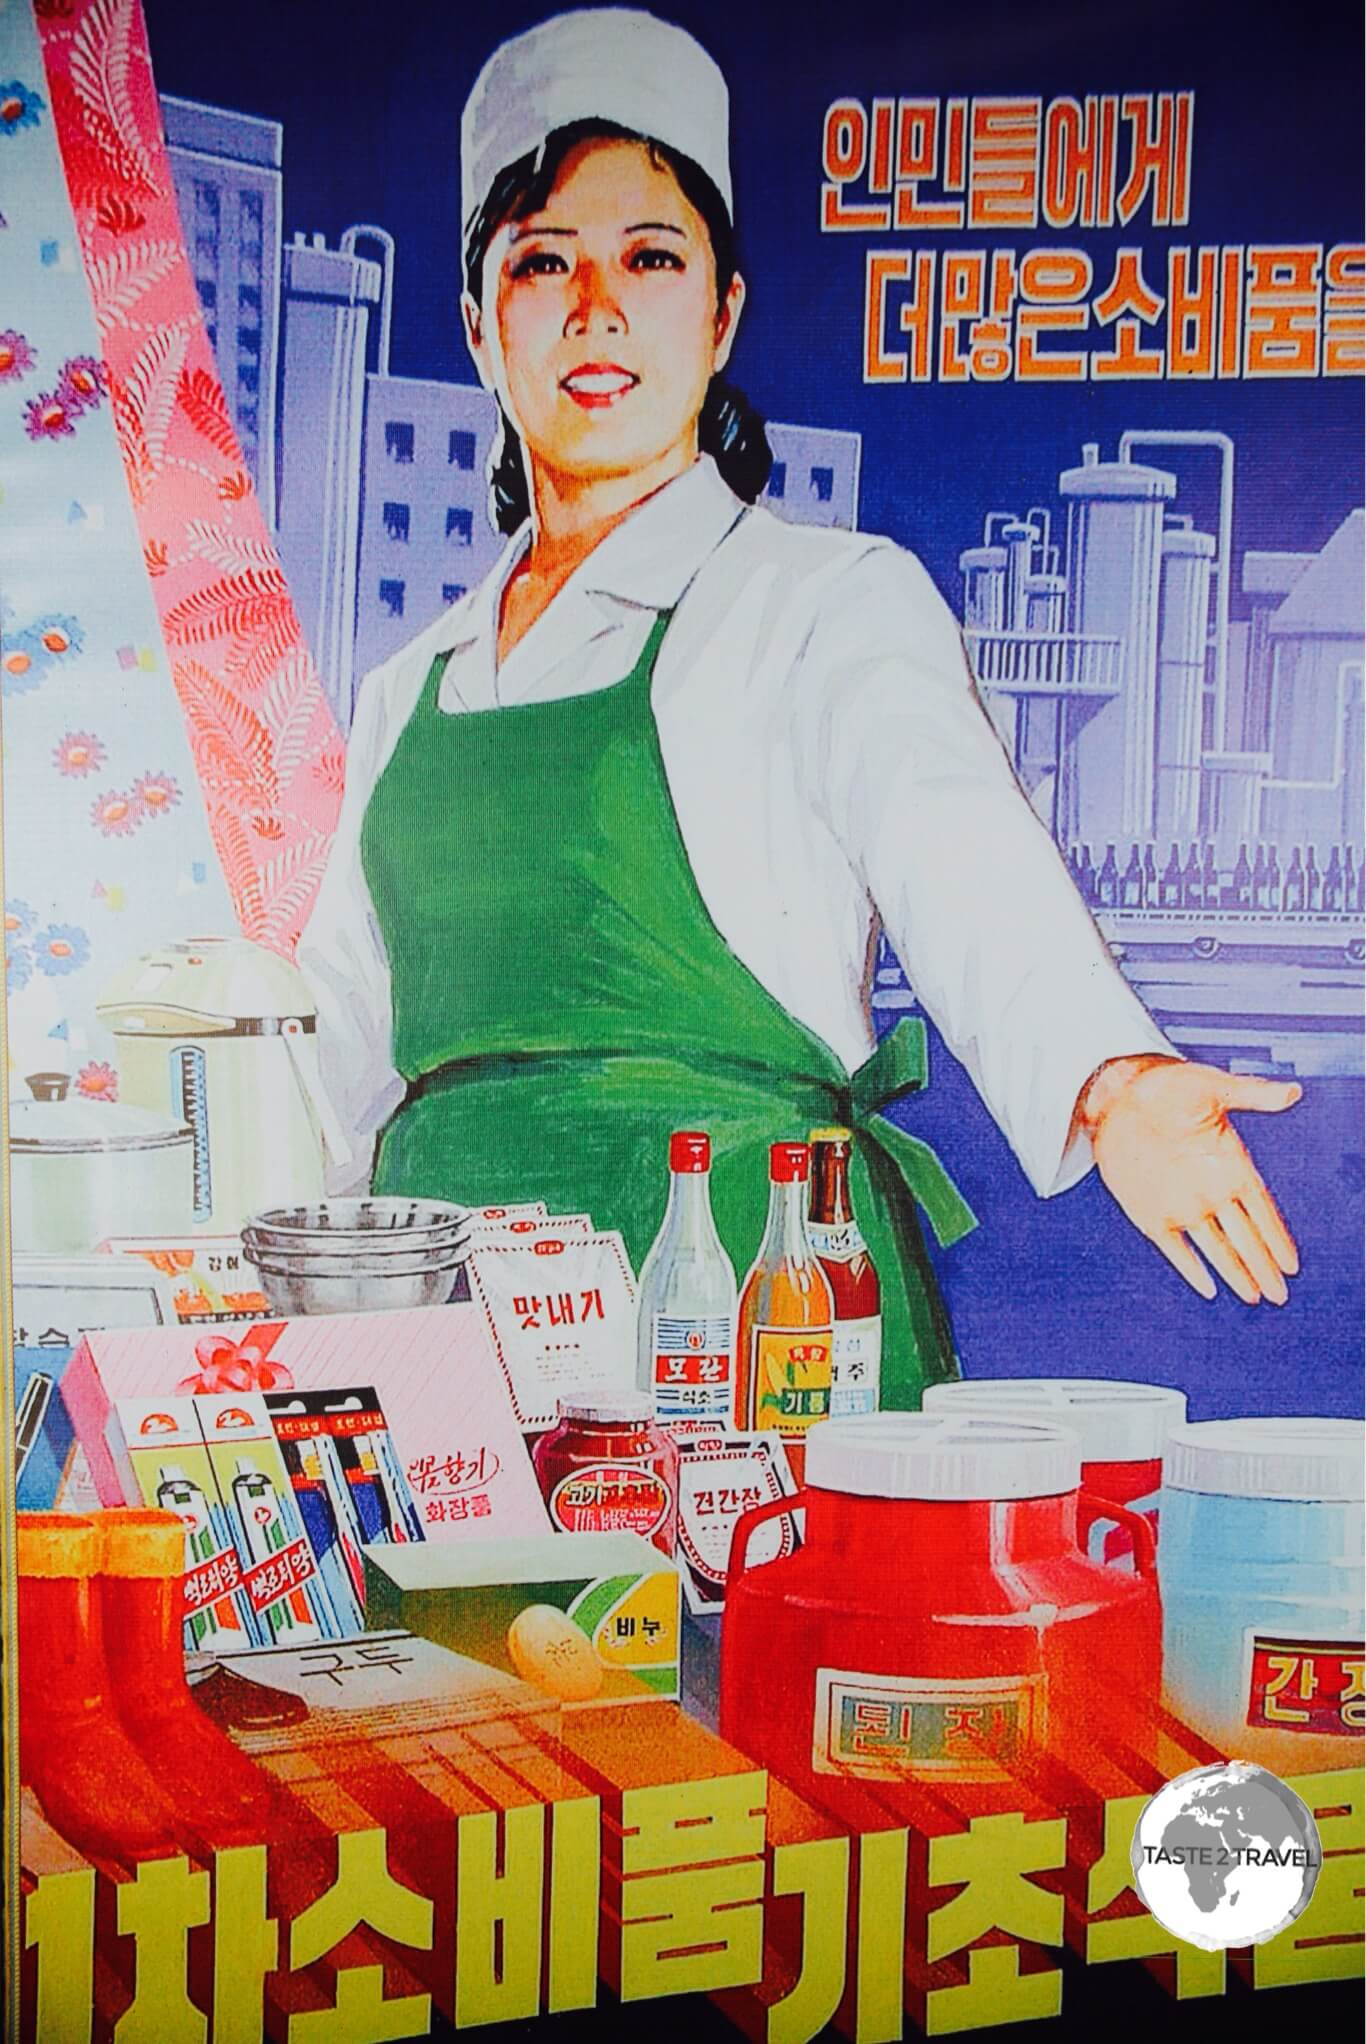 Propaganda poster at the Paeksonri Foodstuffs factory.